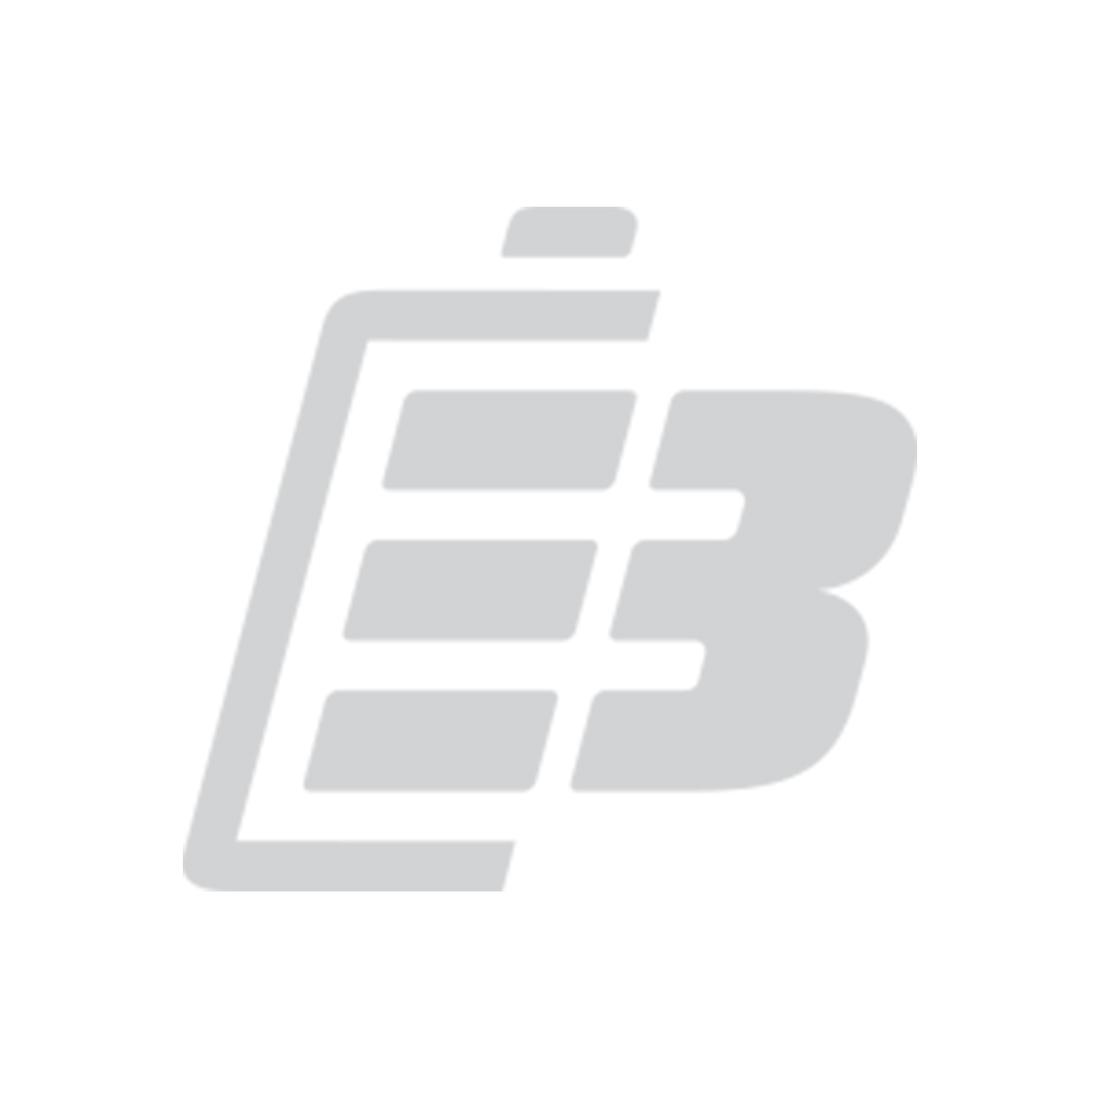 Smartphone battery HTC Desire S_1